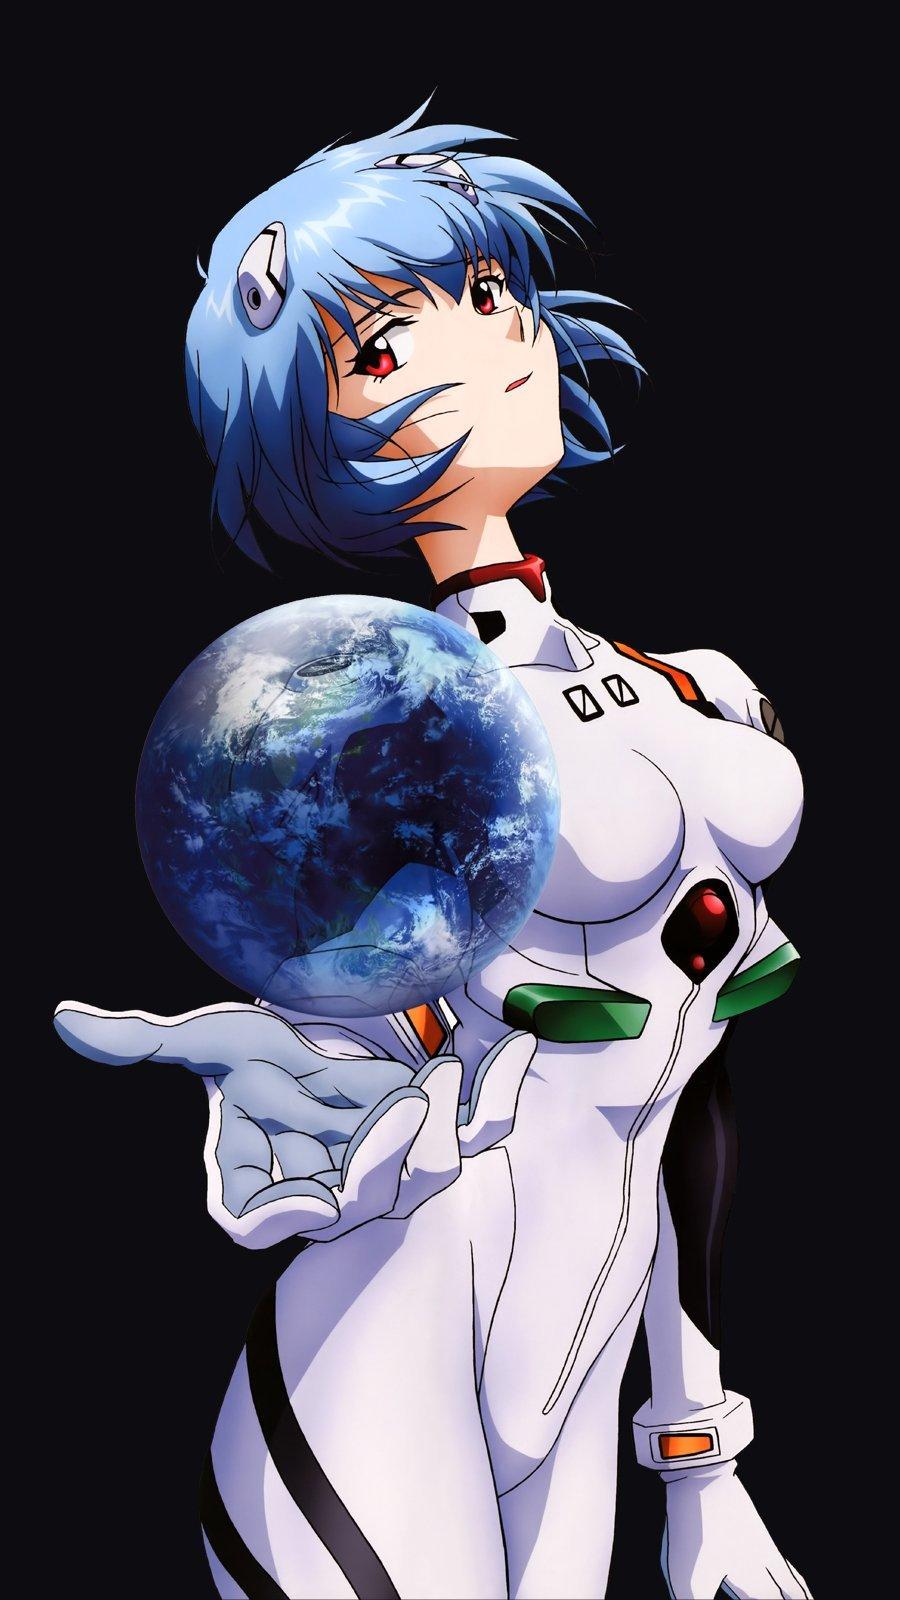 Rei Ayanami From Neon Genesis Evangelion Anime Wallpaper 2k Quad Hd Id 5020